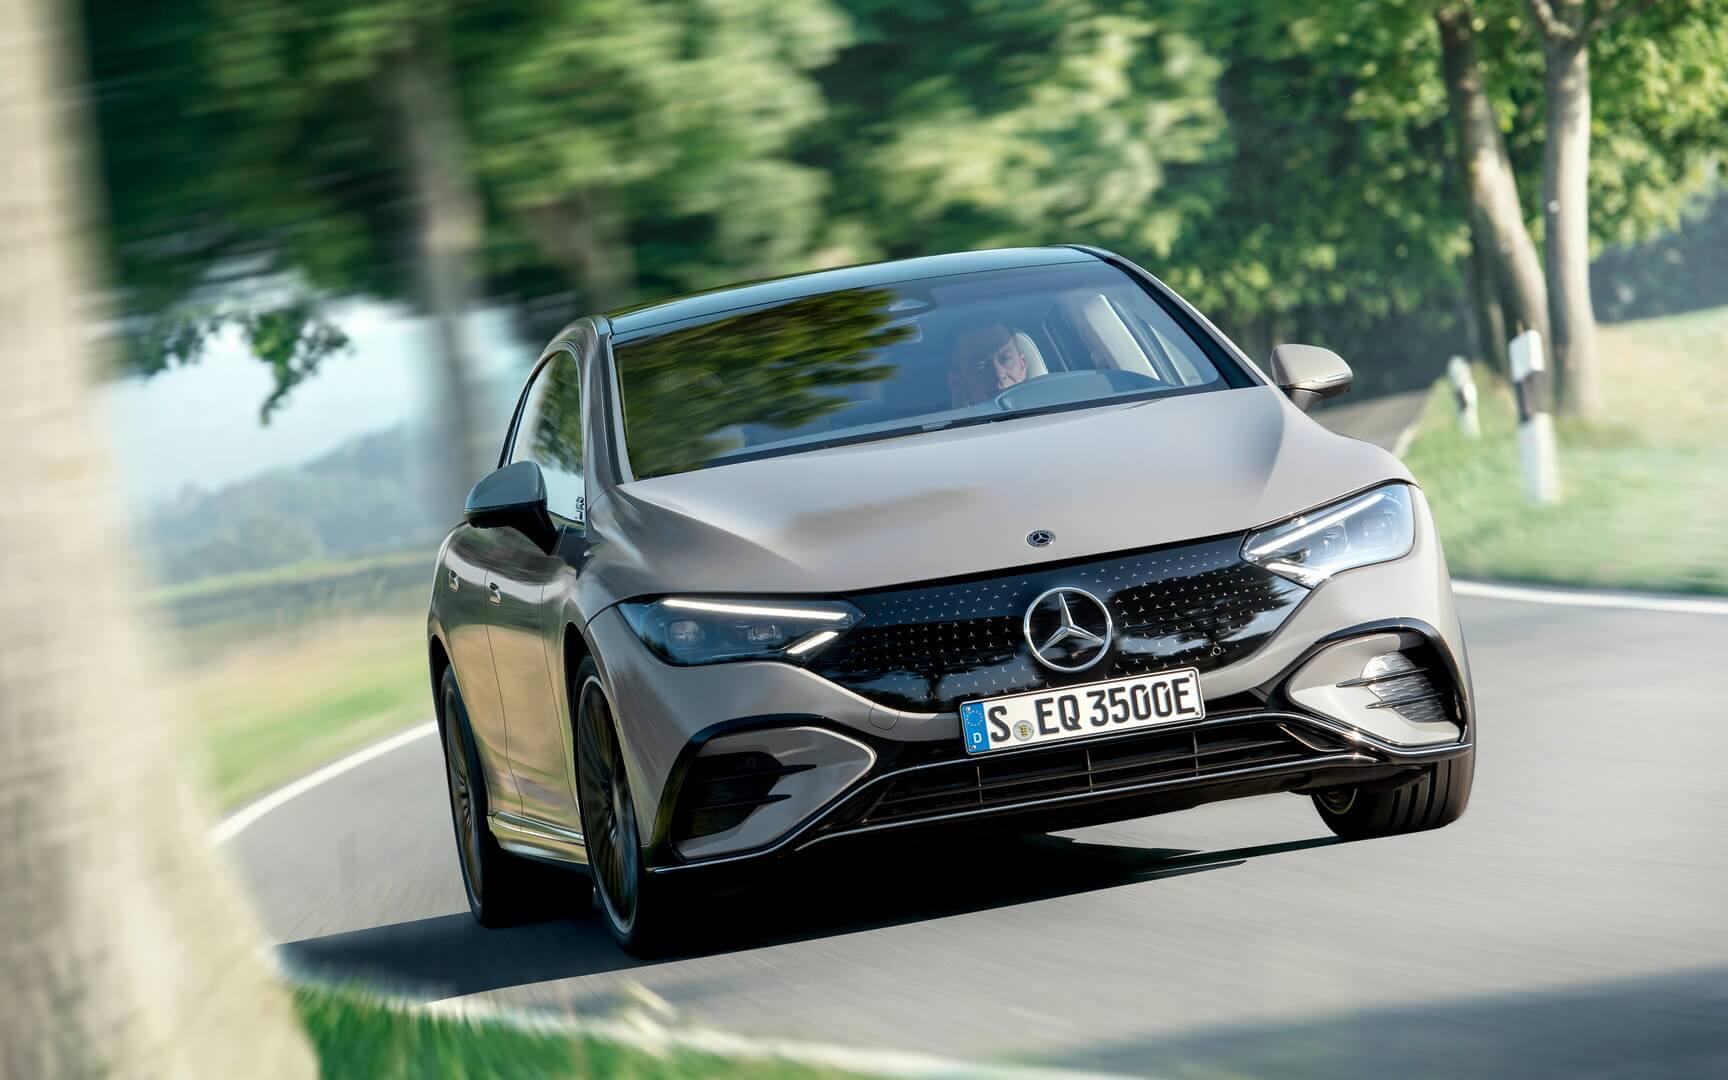 Mercedes-Benz представляет электрический седан EQE с впечатляющим пробегом в 660 км